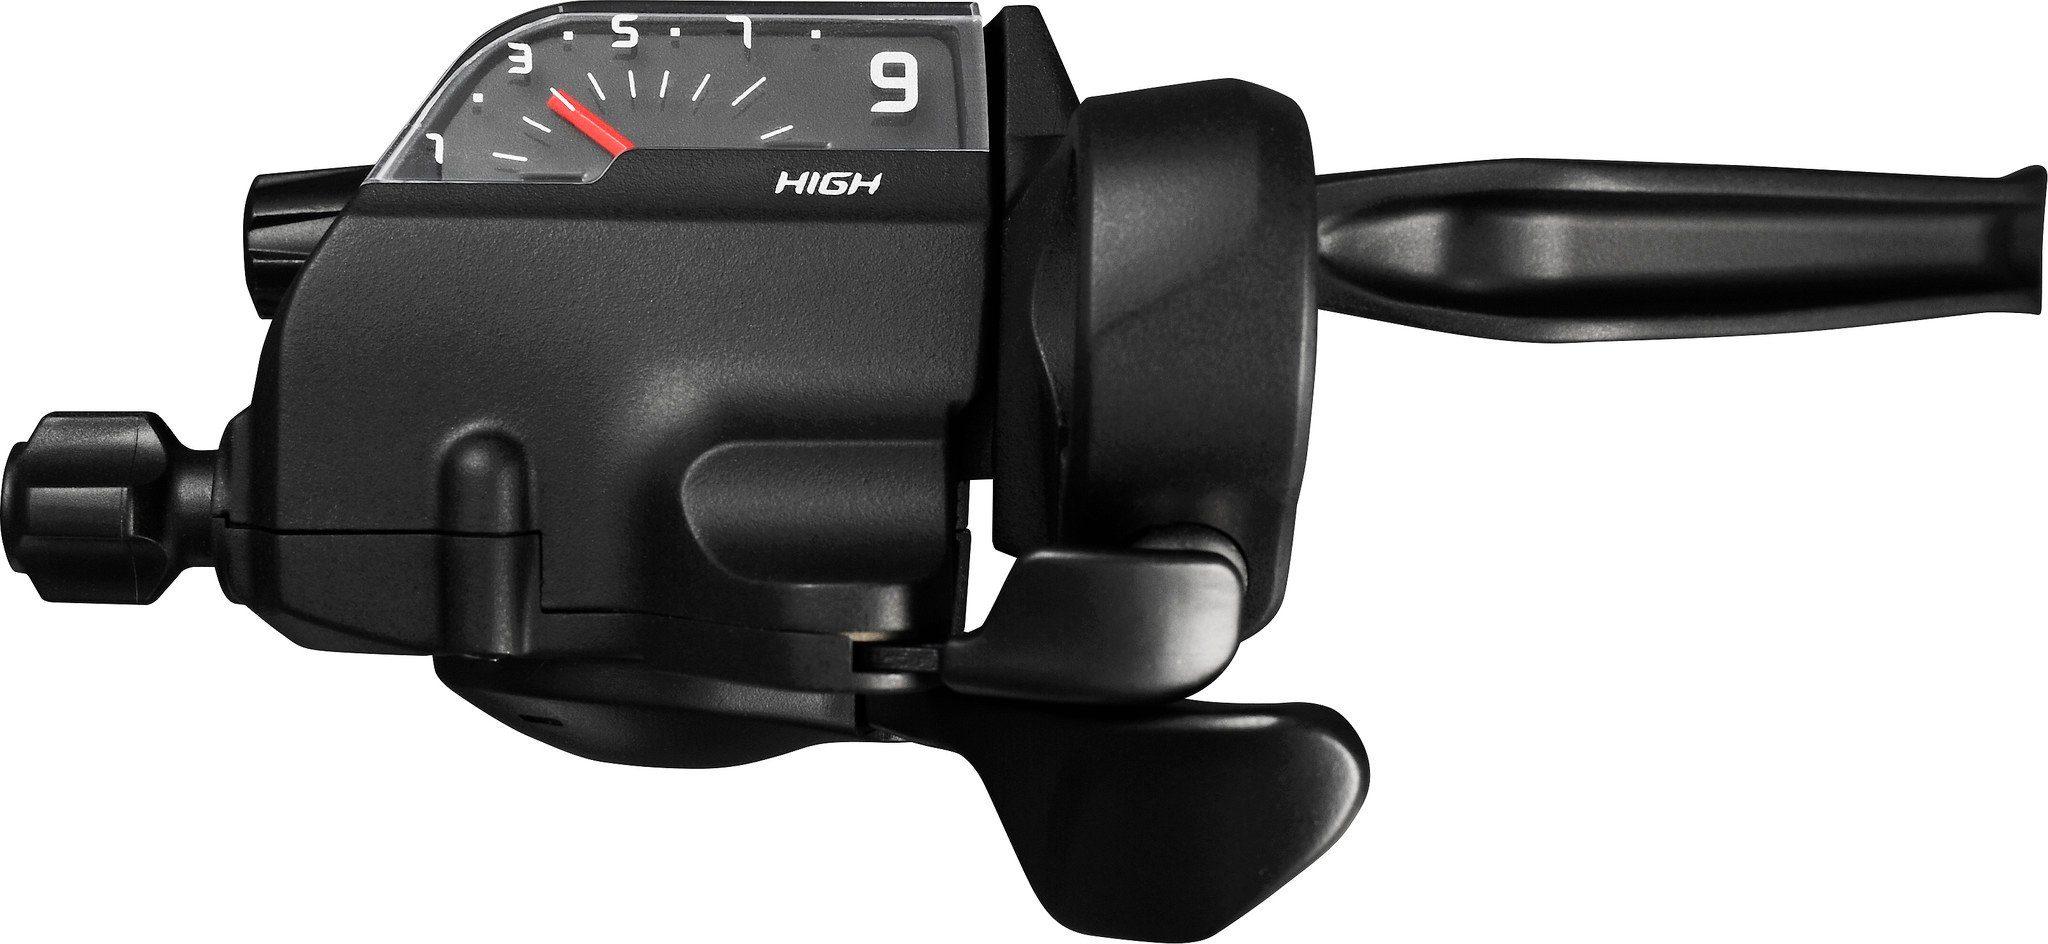 Shimano Bremshebel »Alivio Trekking ST-T4000 Schalt-/Bremshebel 9-fach«